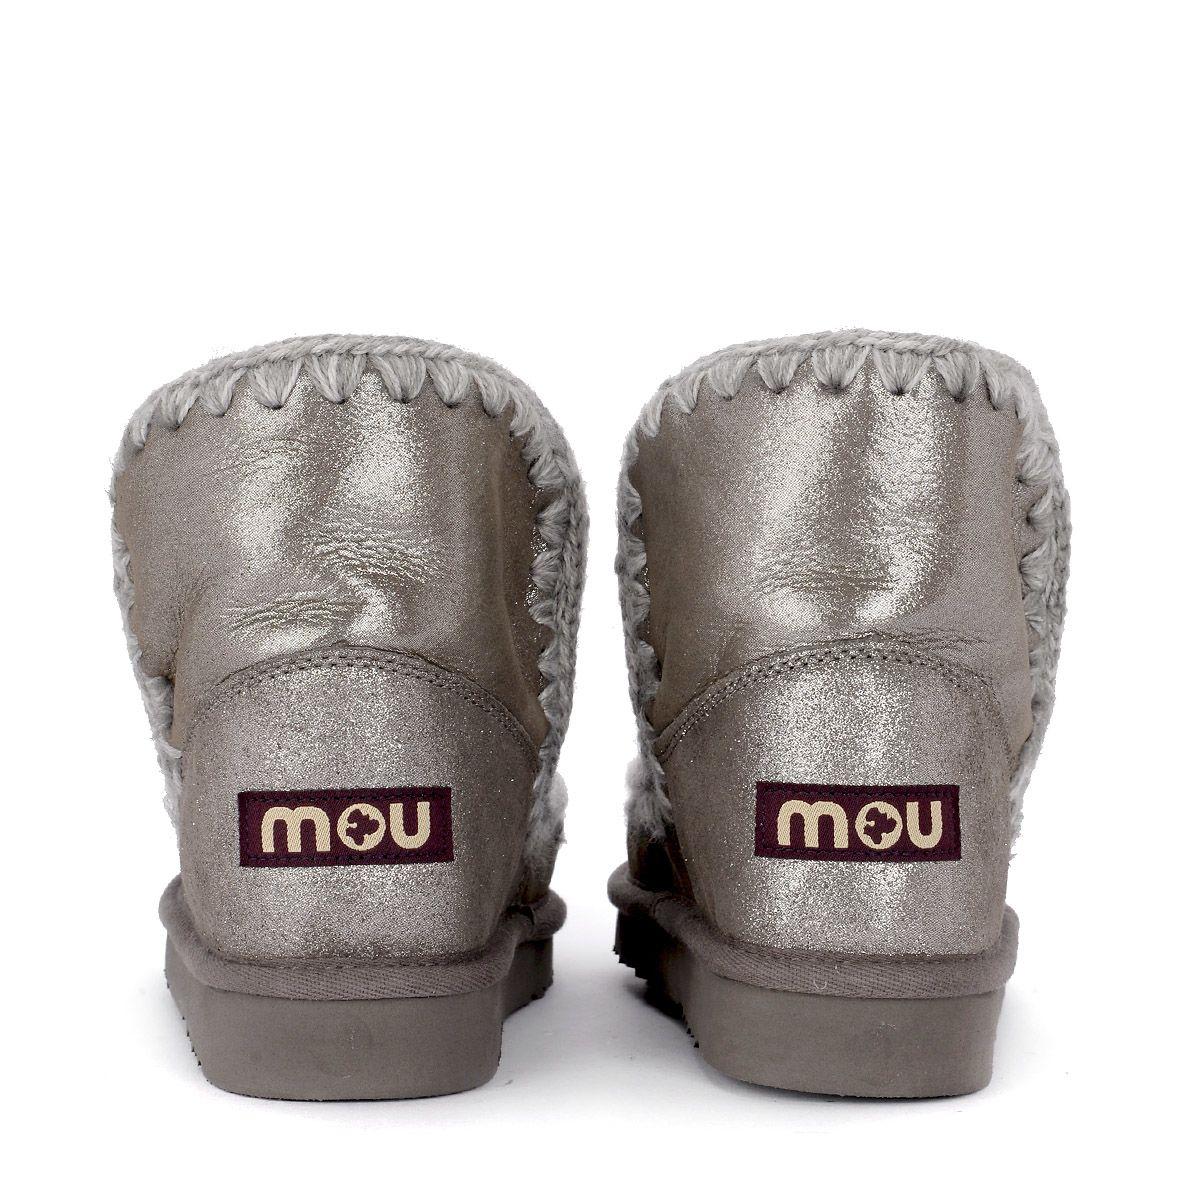 a46adfb7d03 Mou Mou Eskimo 18 Silver Micoglitter Sheepskin Ankle Boots - ARGENTO ...